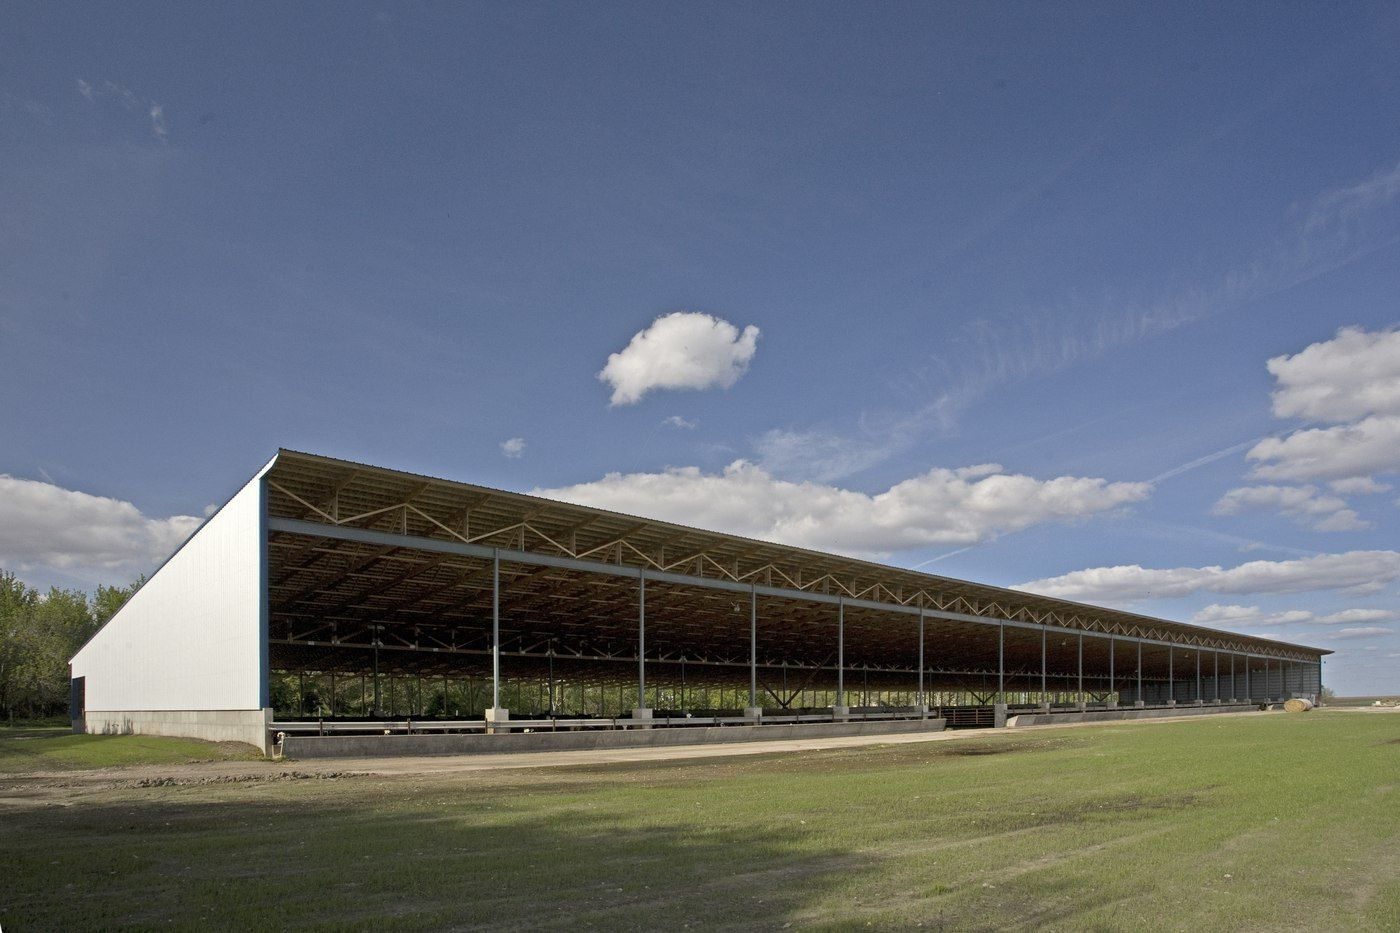 Craig Sandven_Bed Pack Facility_Monoslope Beef Barn